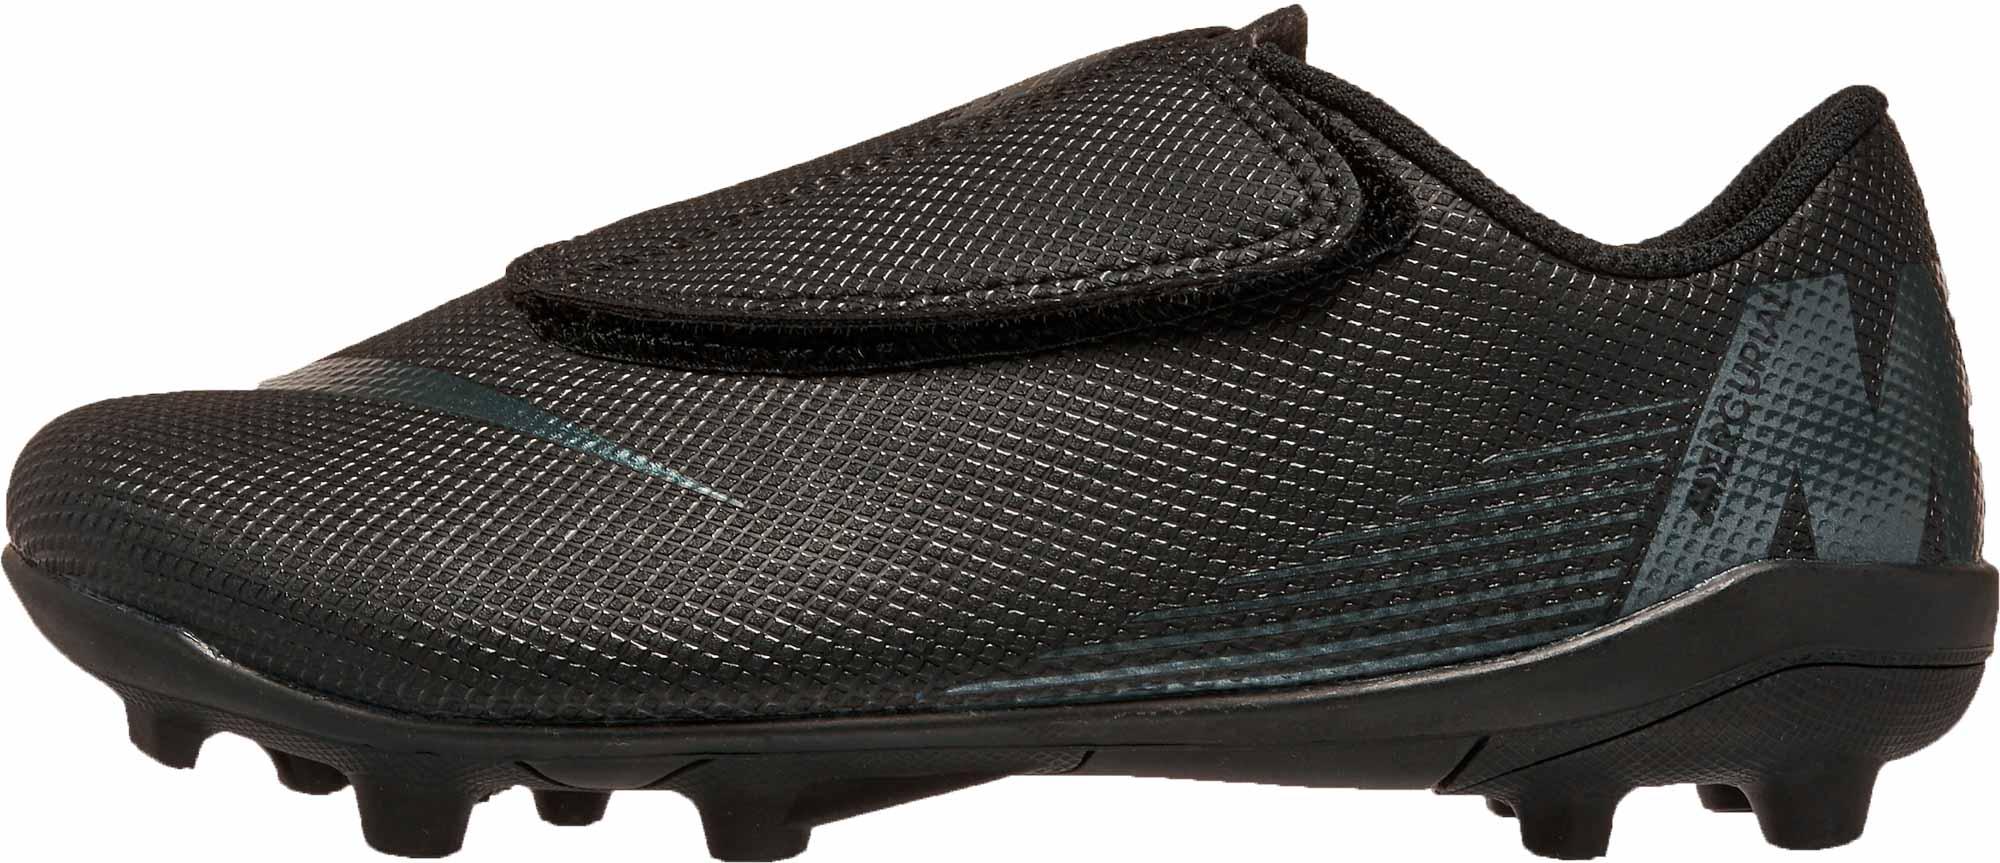 pecho cinta Secreto  Nike Mercurial Vapor 12 Club MG (velcro) - Youth - Black/Black - Cleatsxp